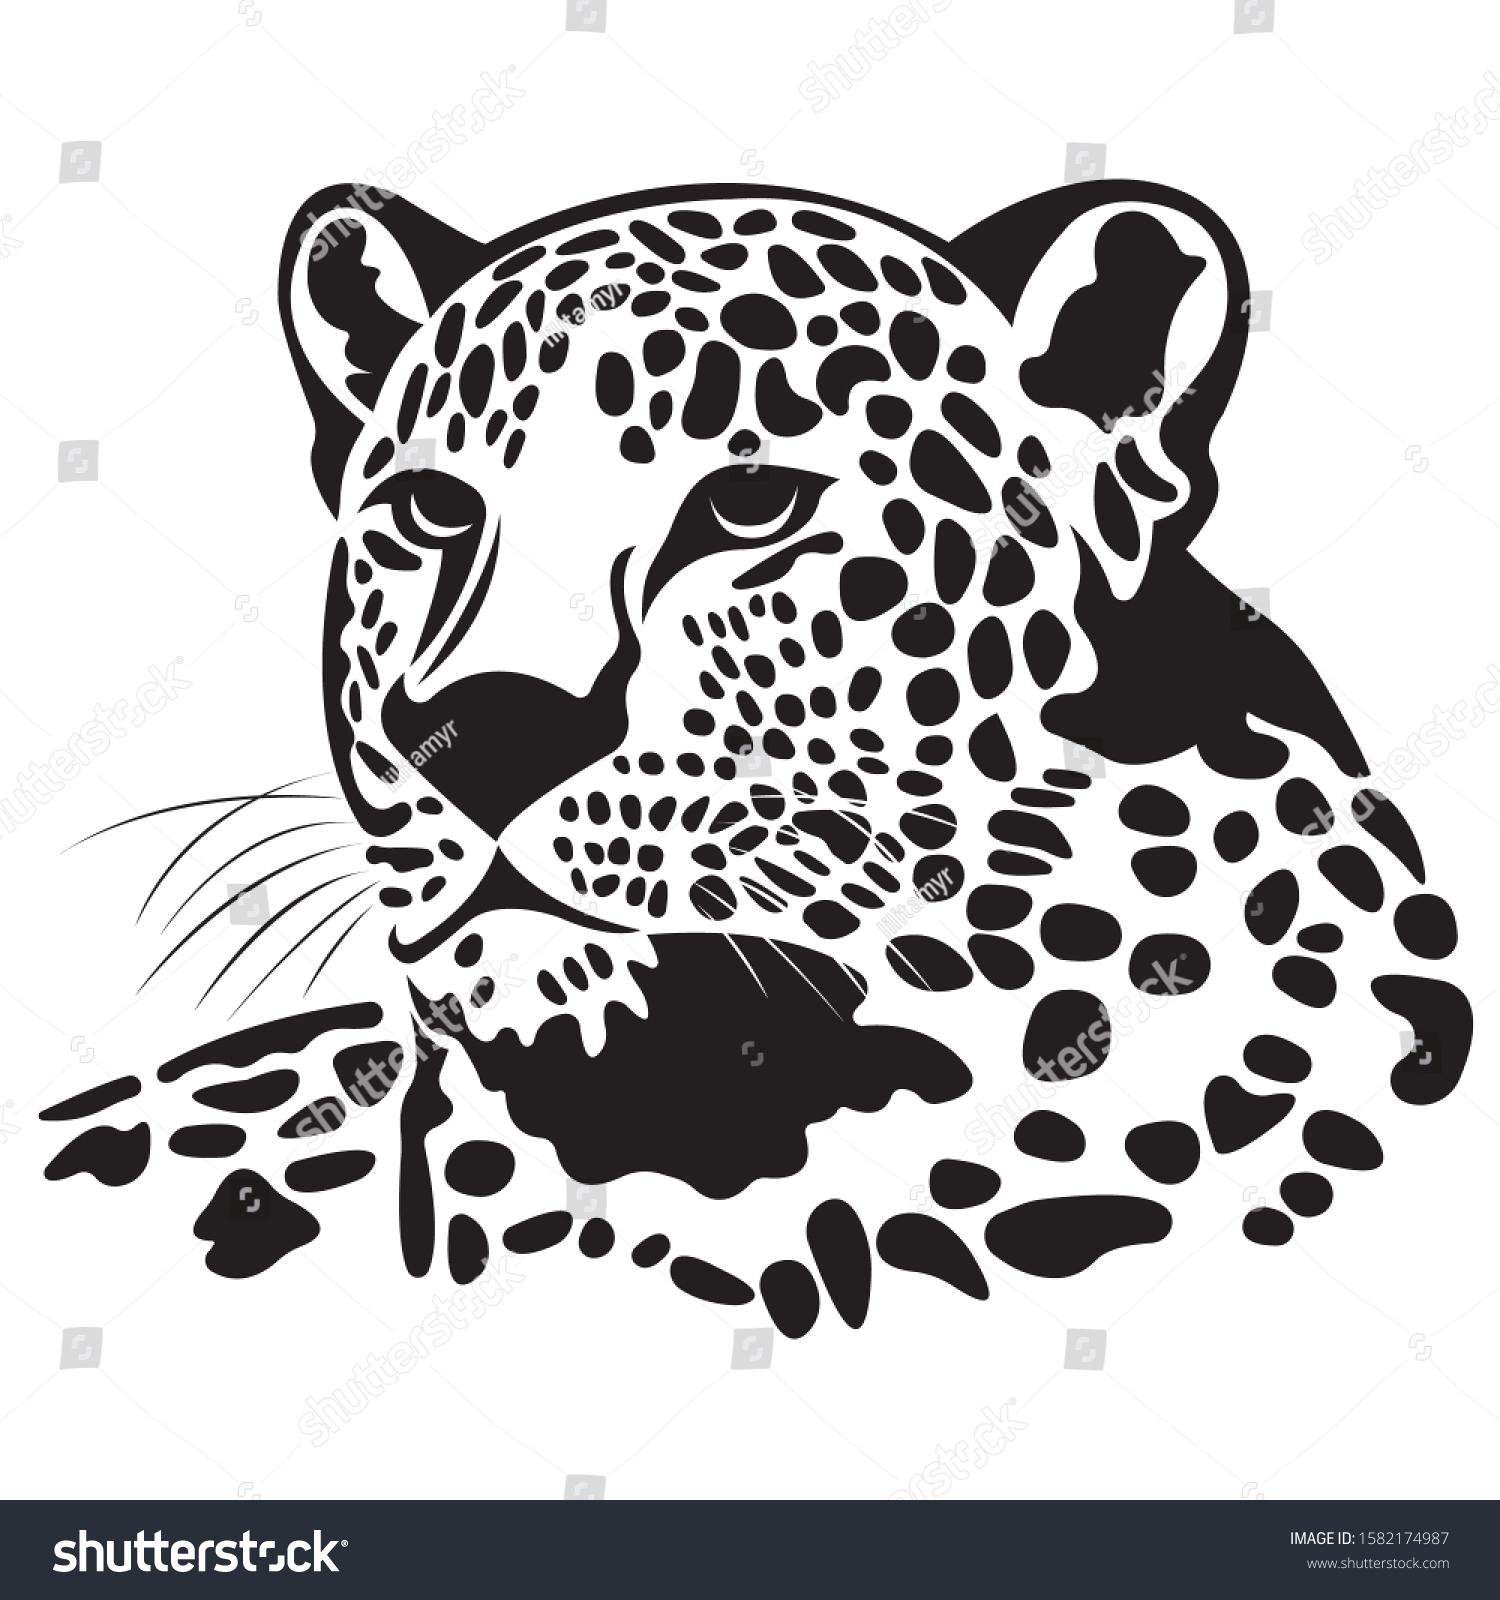 Silhouette Jaguar Head Painted Black Various Stock Vector Royalty Free 1582174987